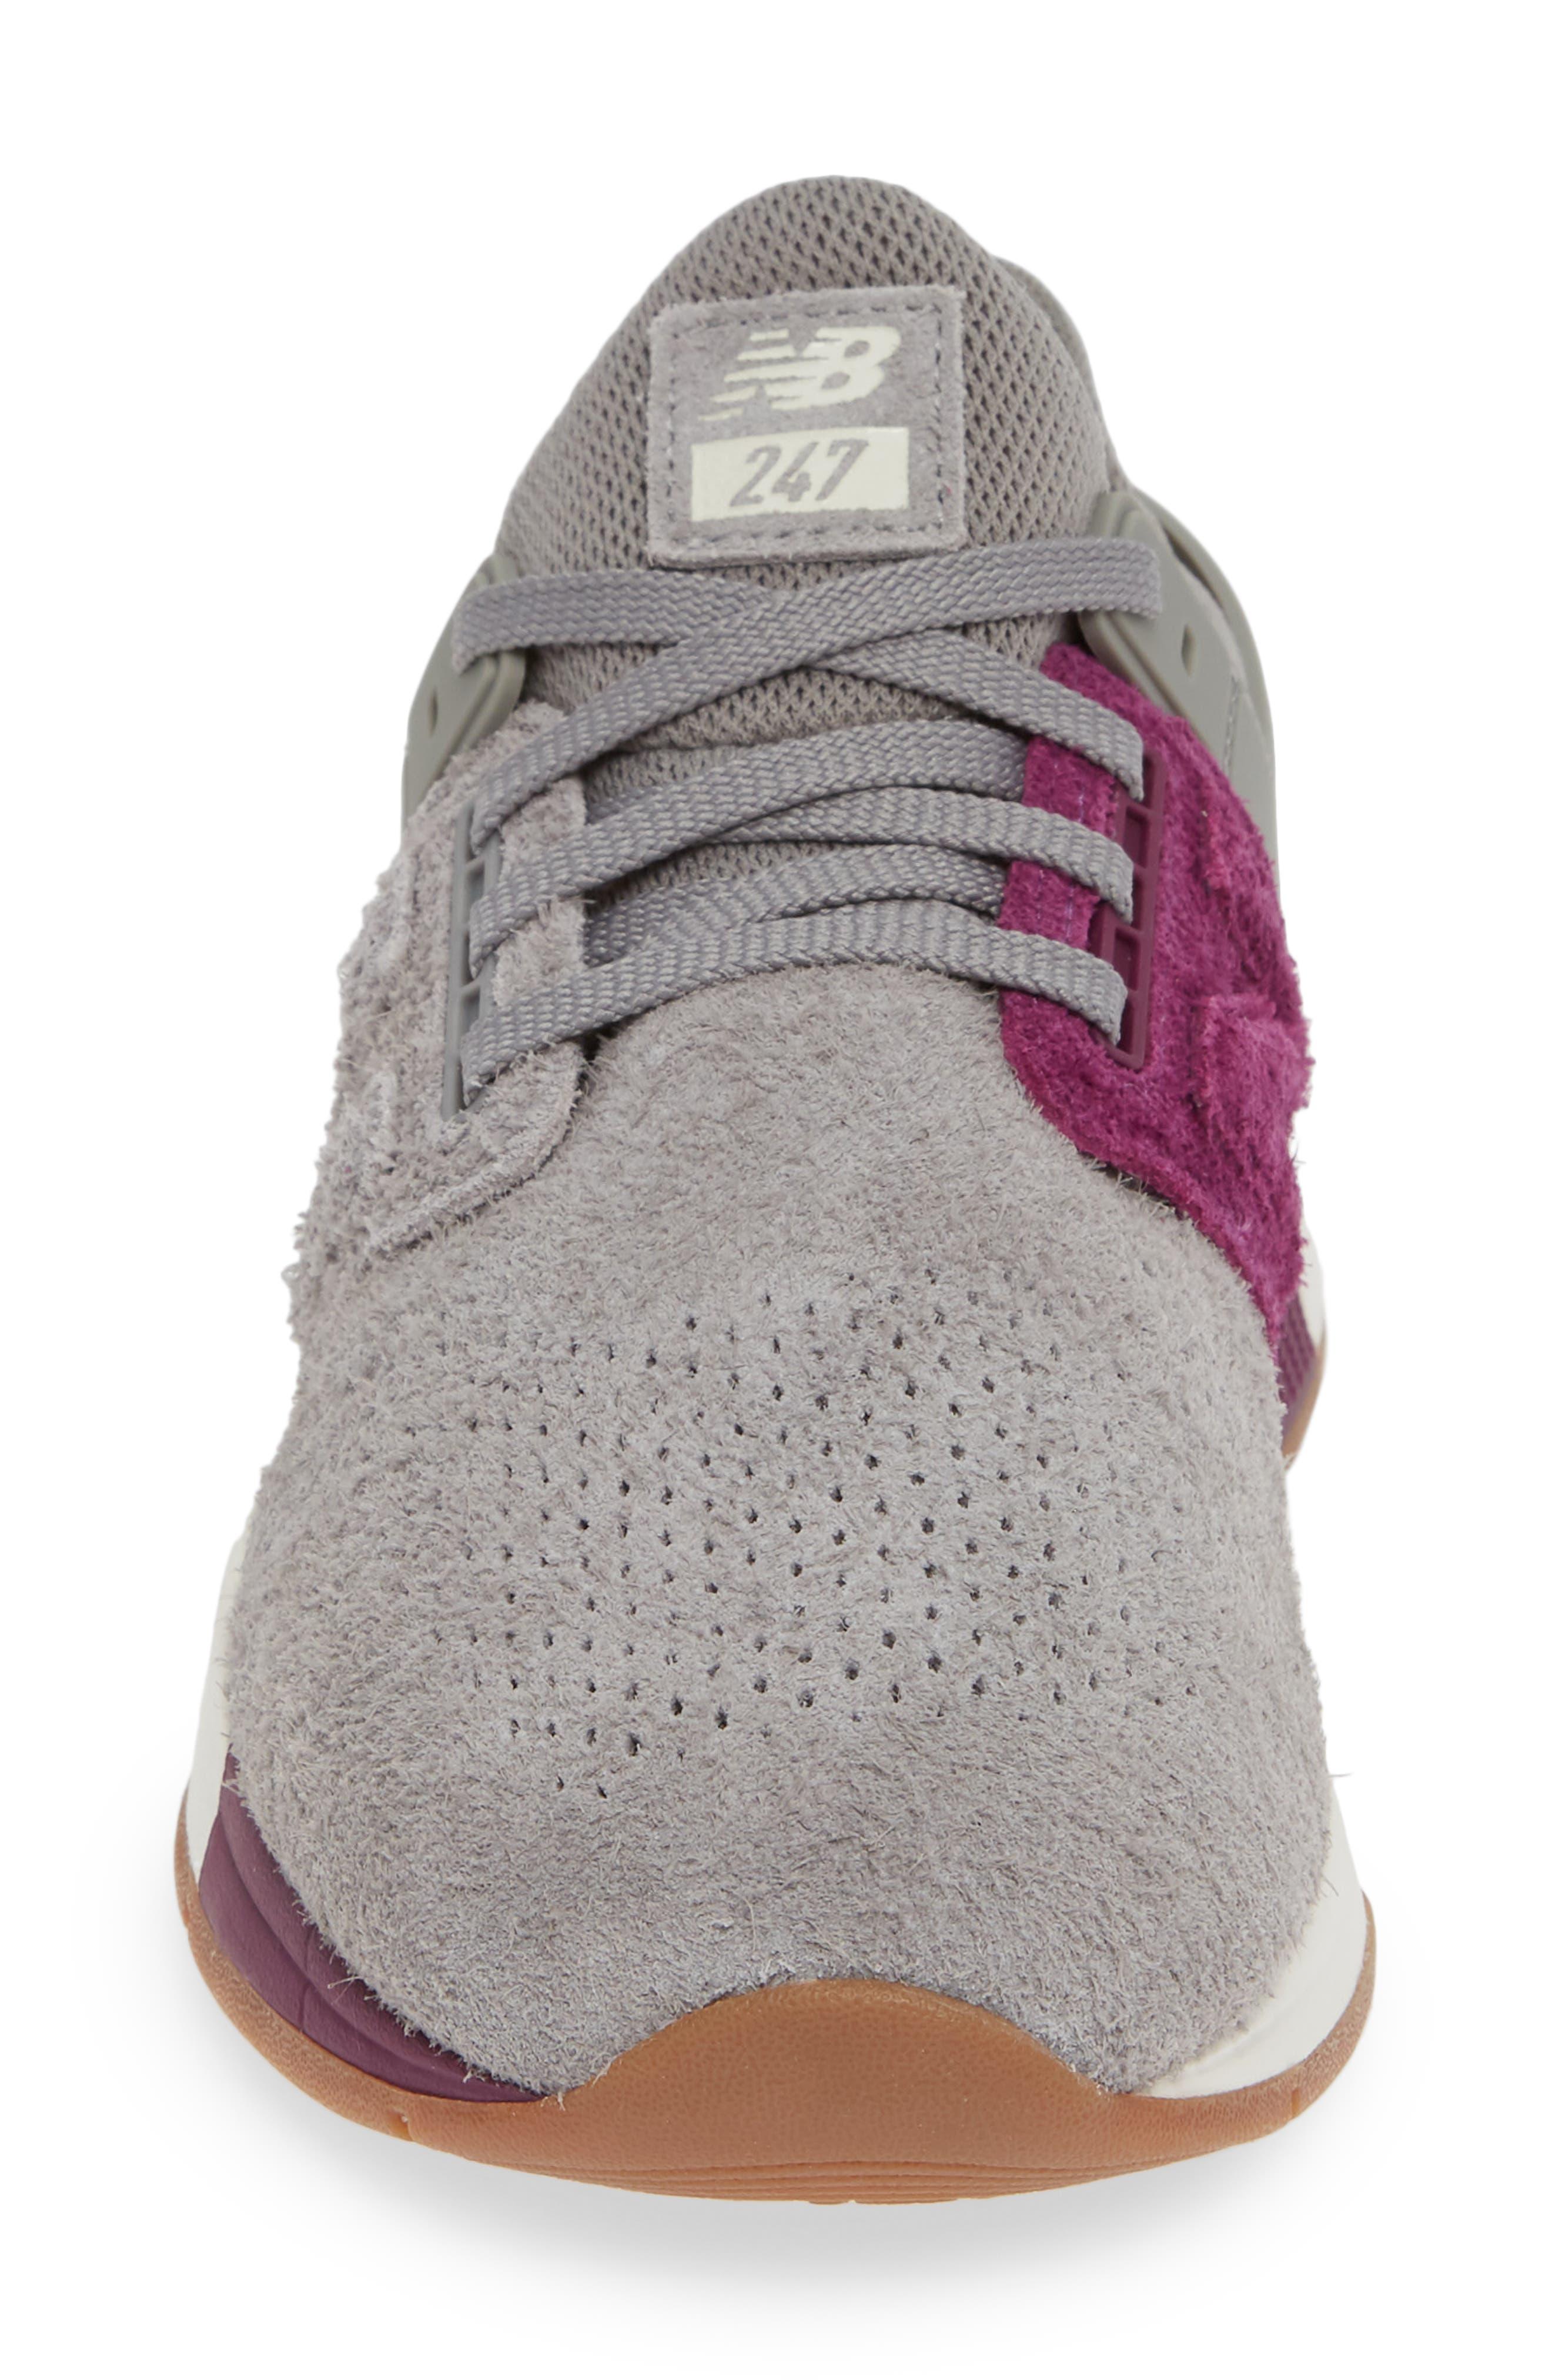 247 Suede Sneaker,                             Alternate thumbnail 4, color,                             MARBLEHEAD SUEDE